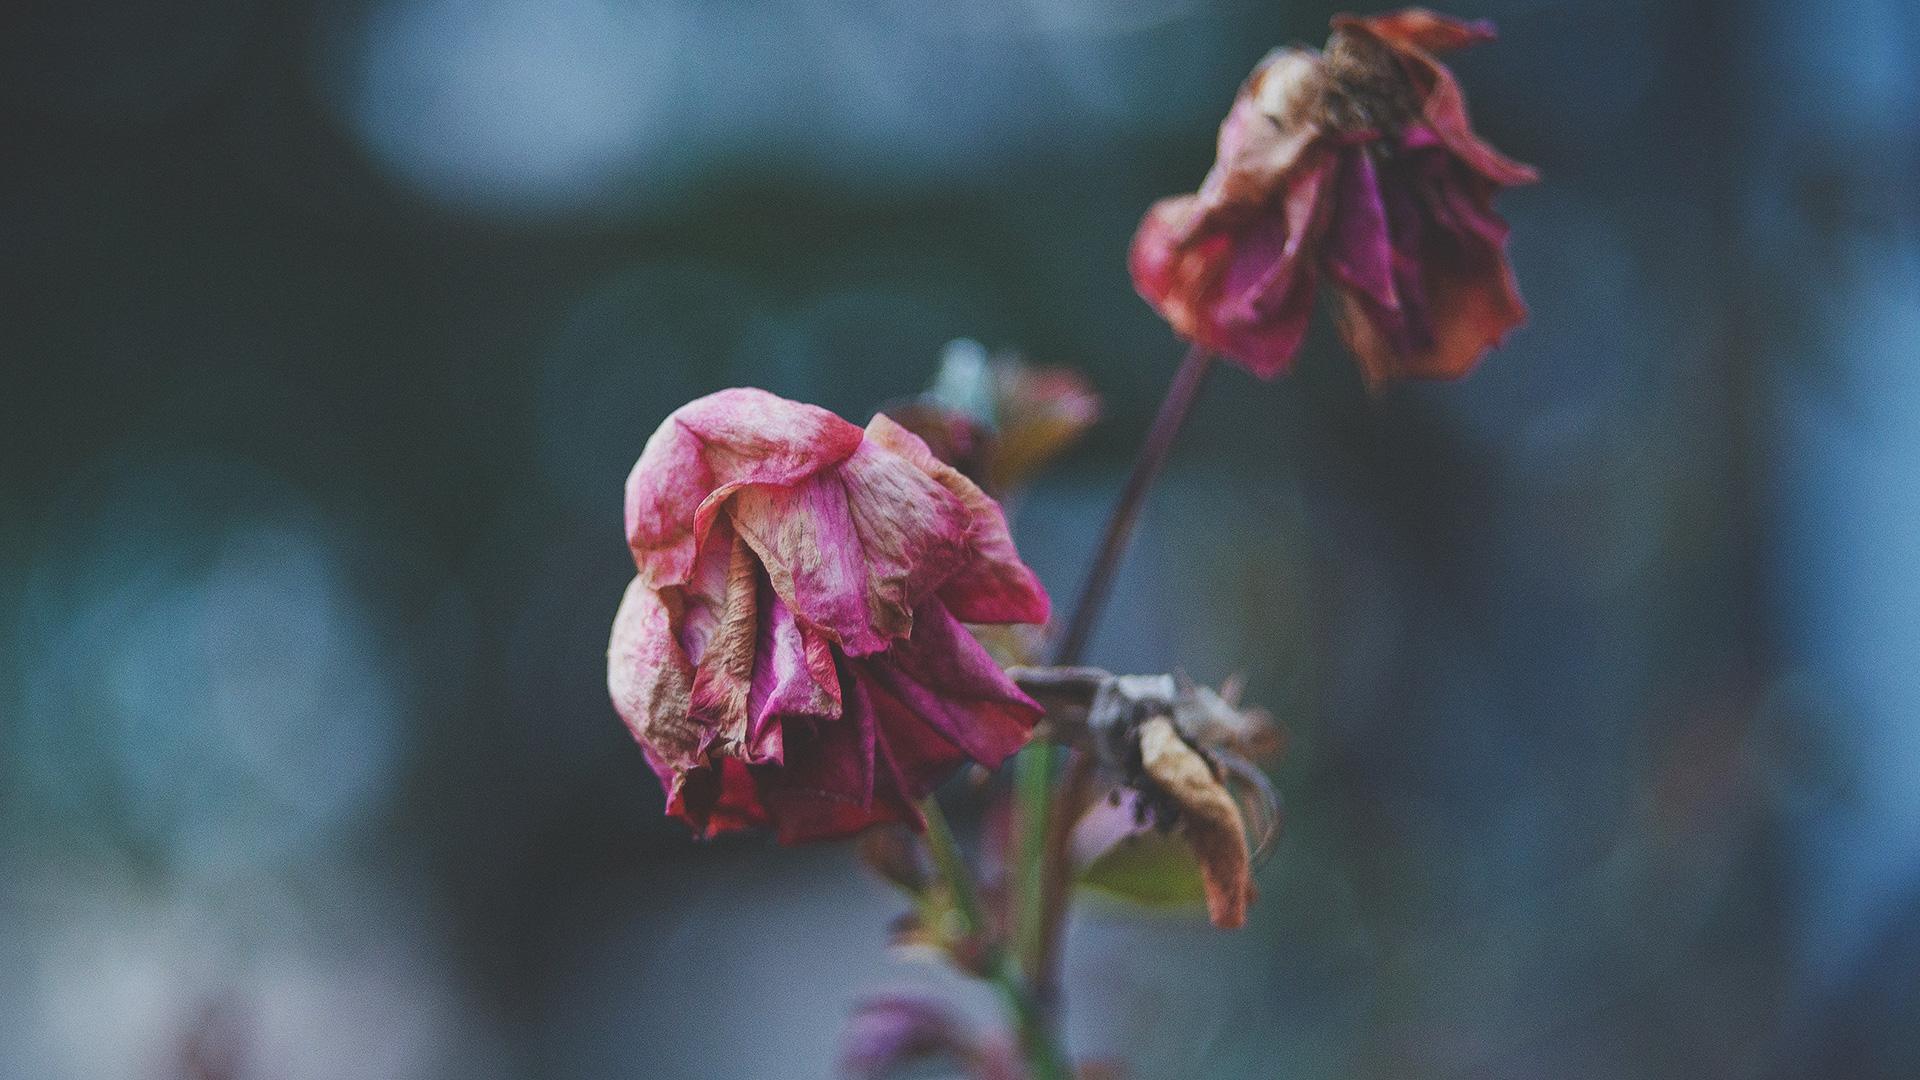 J. Todd Billings – Embracing Our Mortality | Steve Brown, Etc.